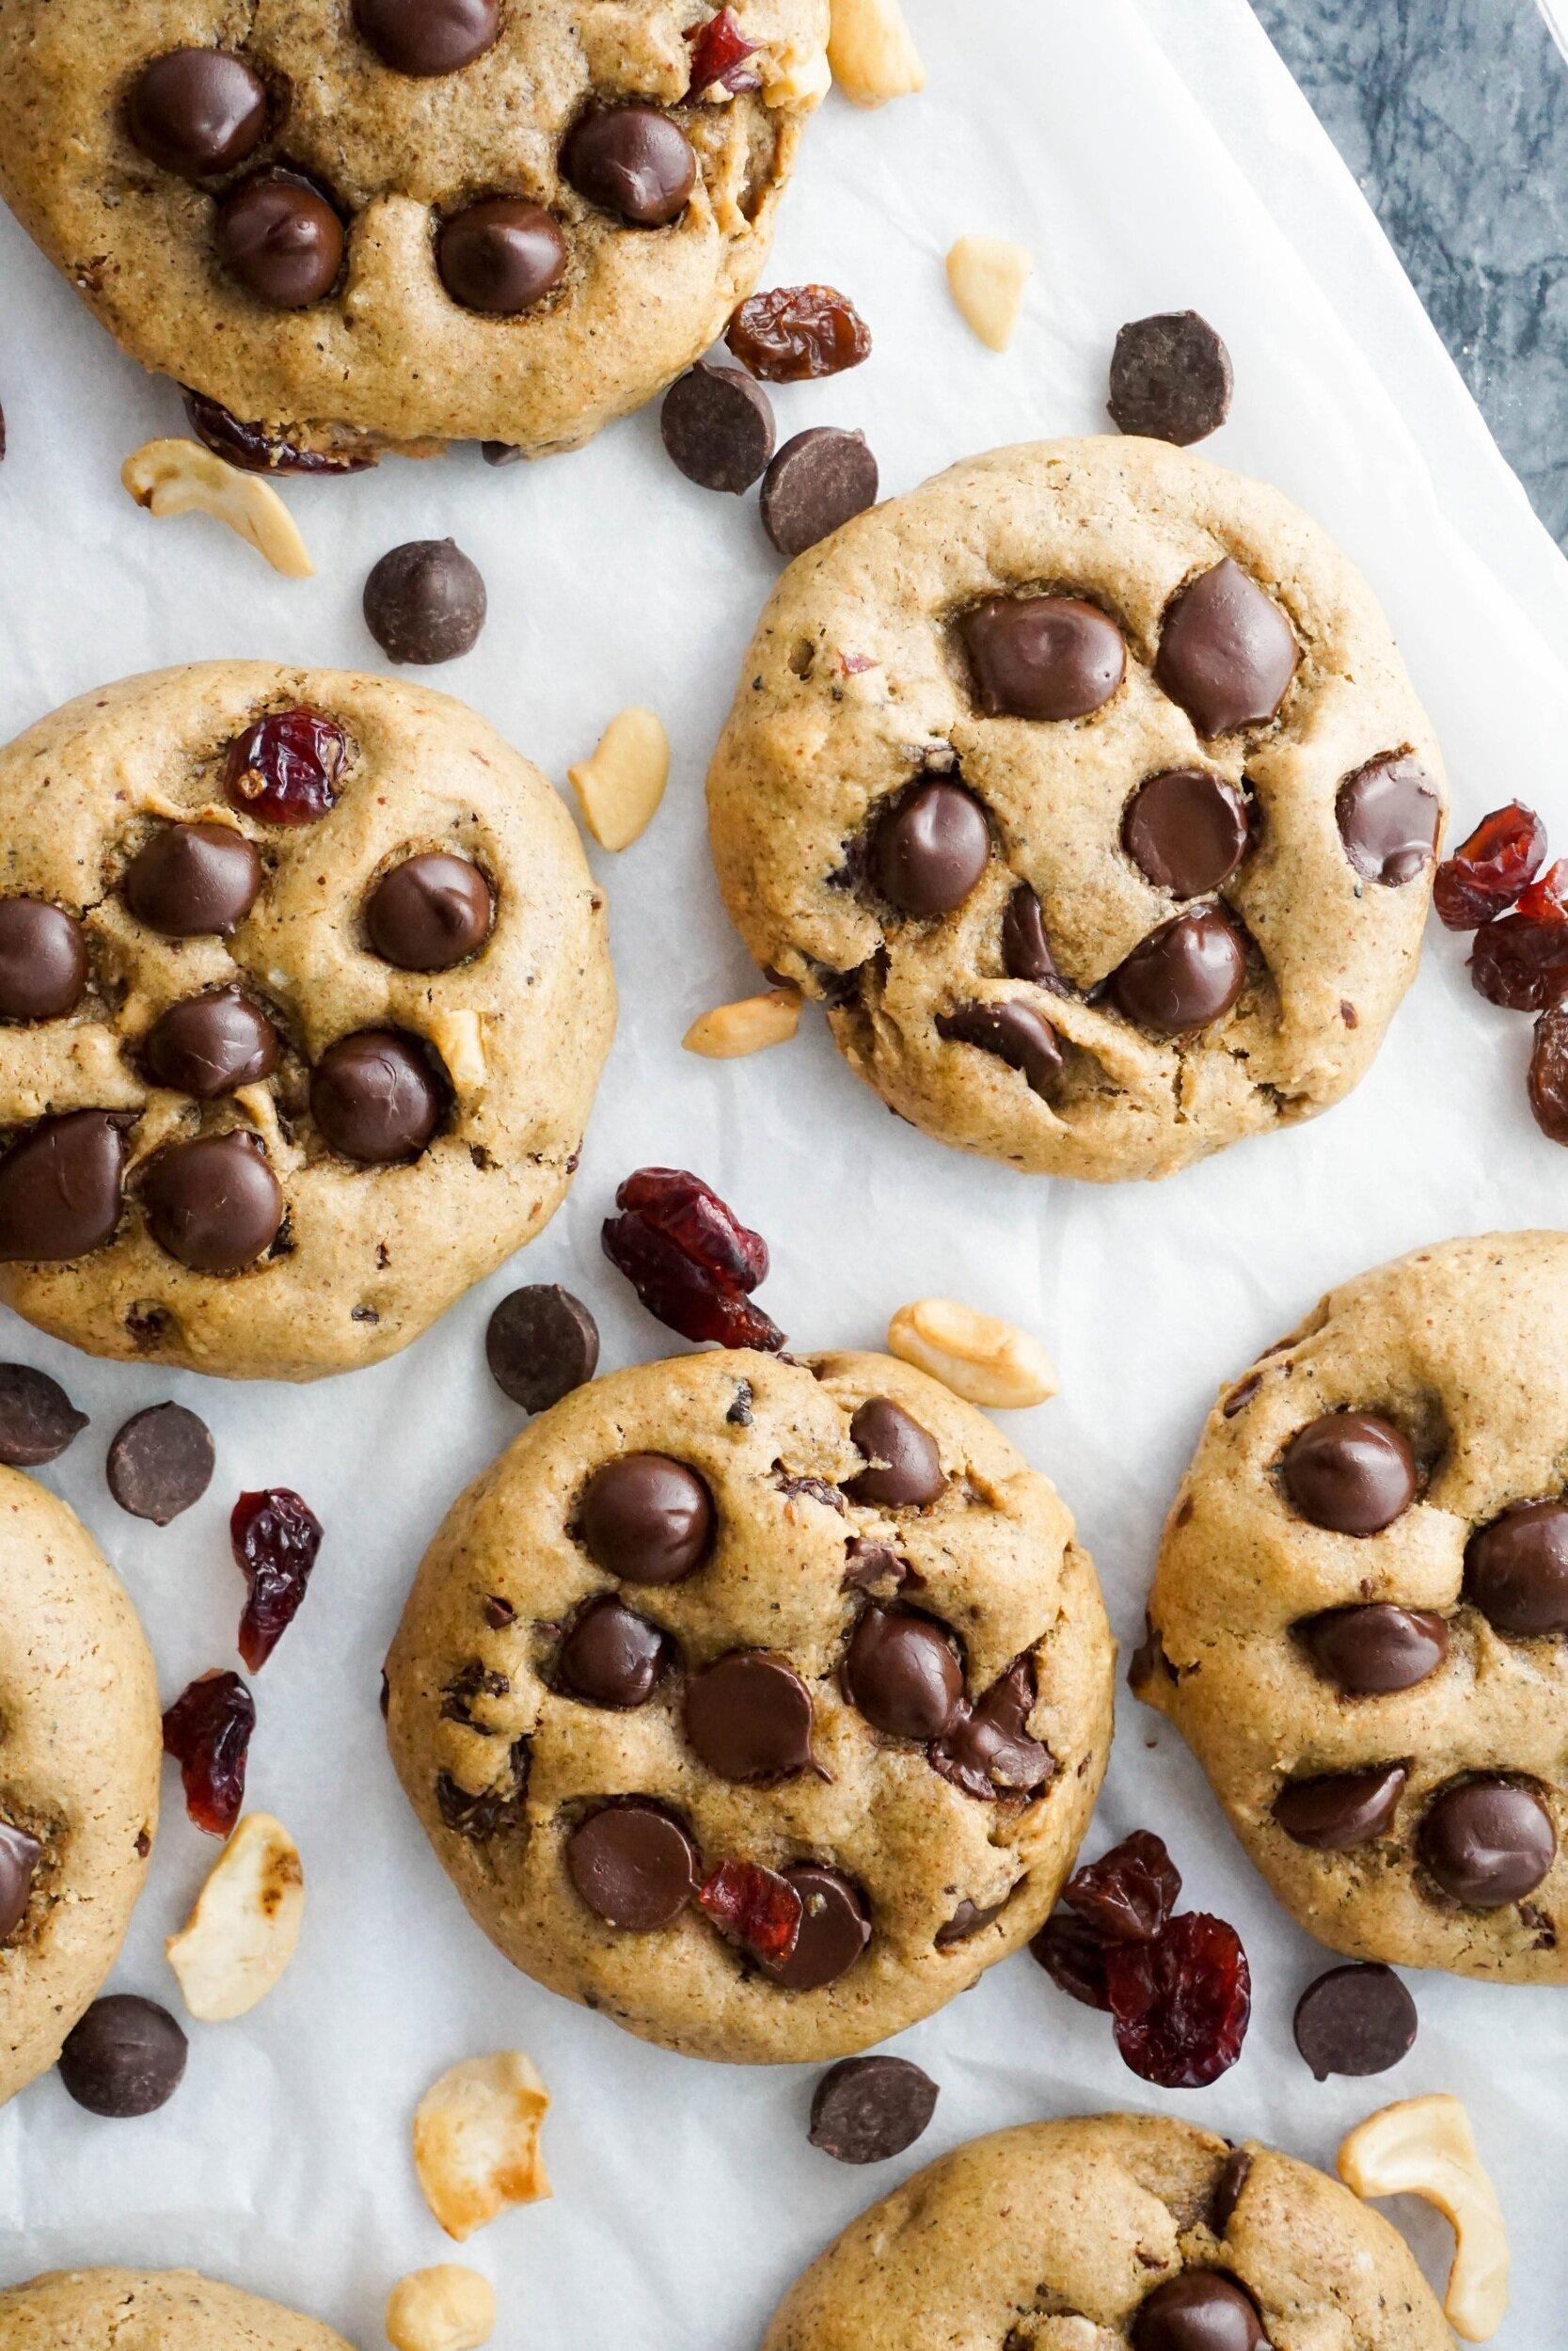 Chocolate Chip Cranberry Cashew Breakfast Cookies